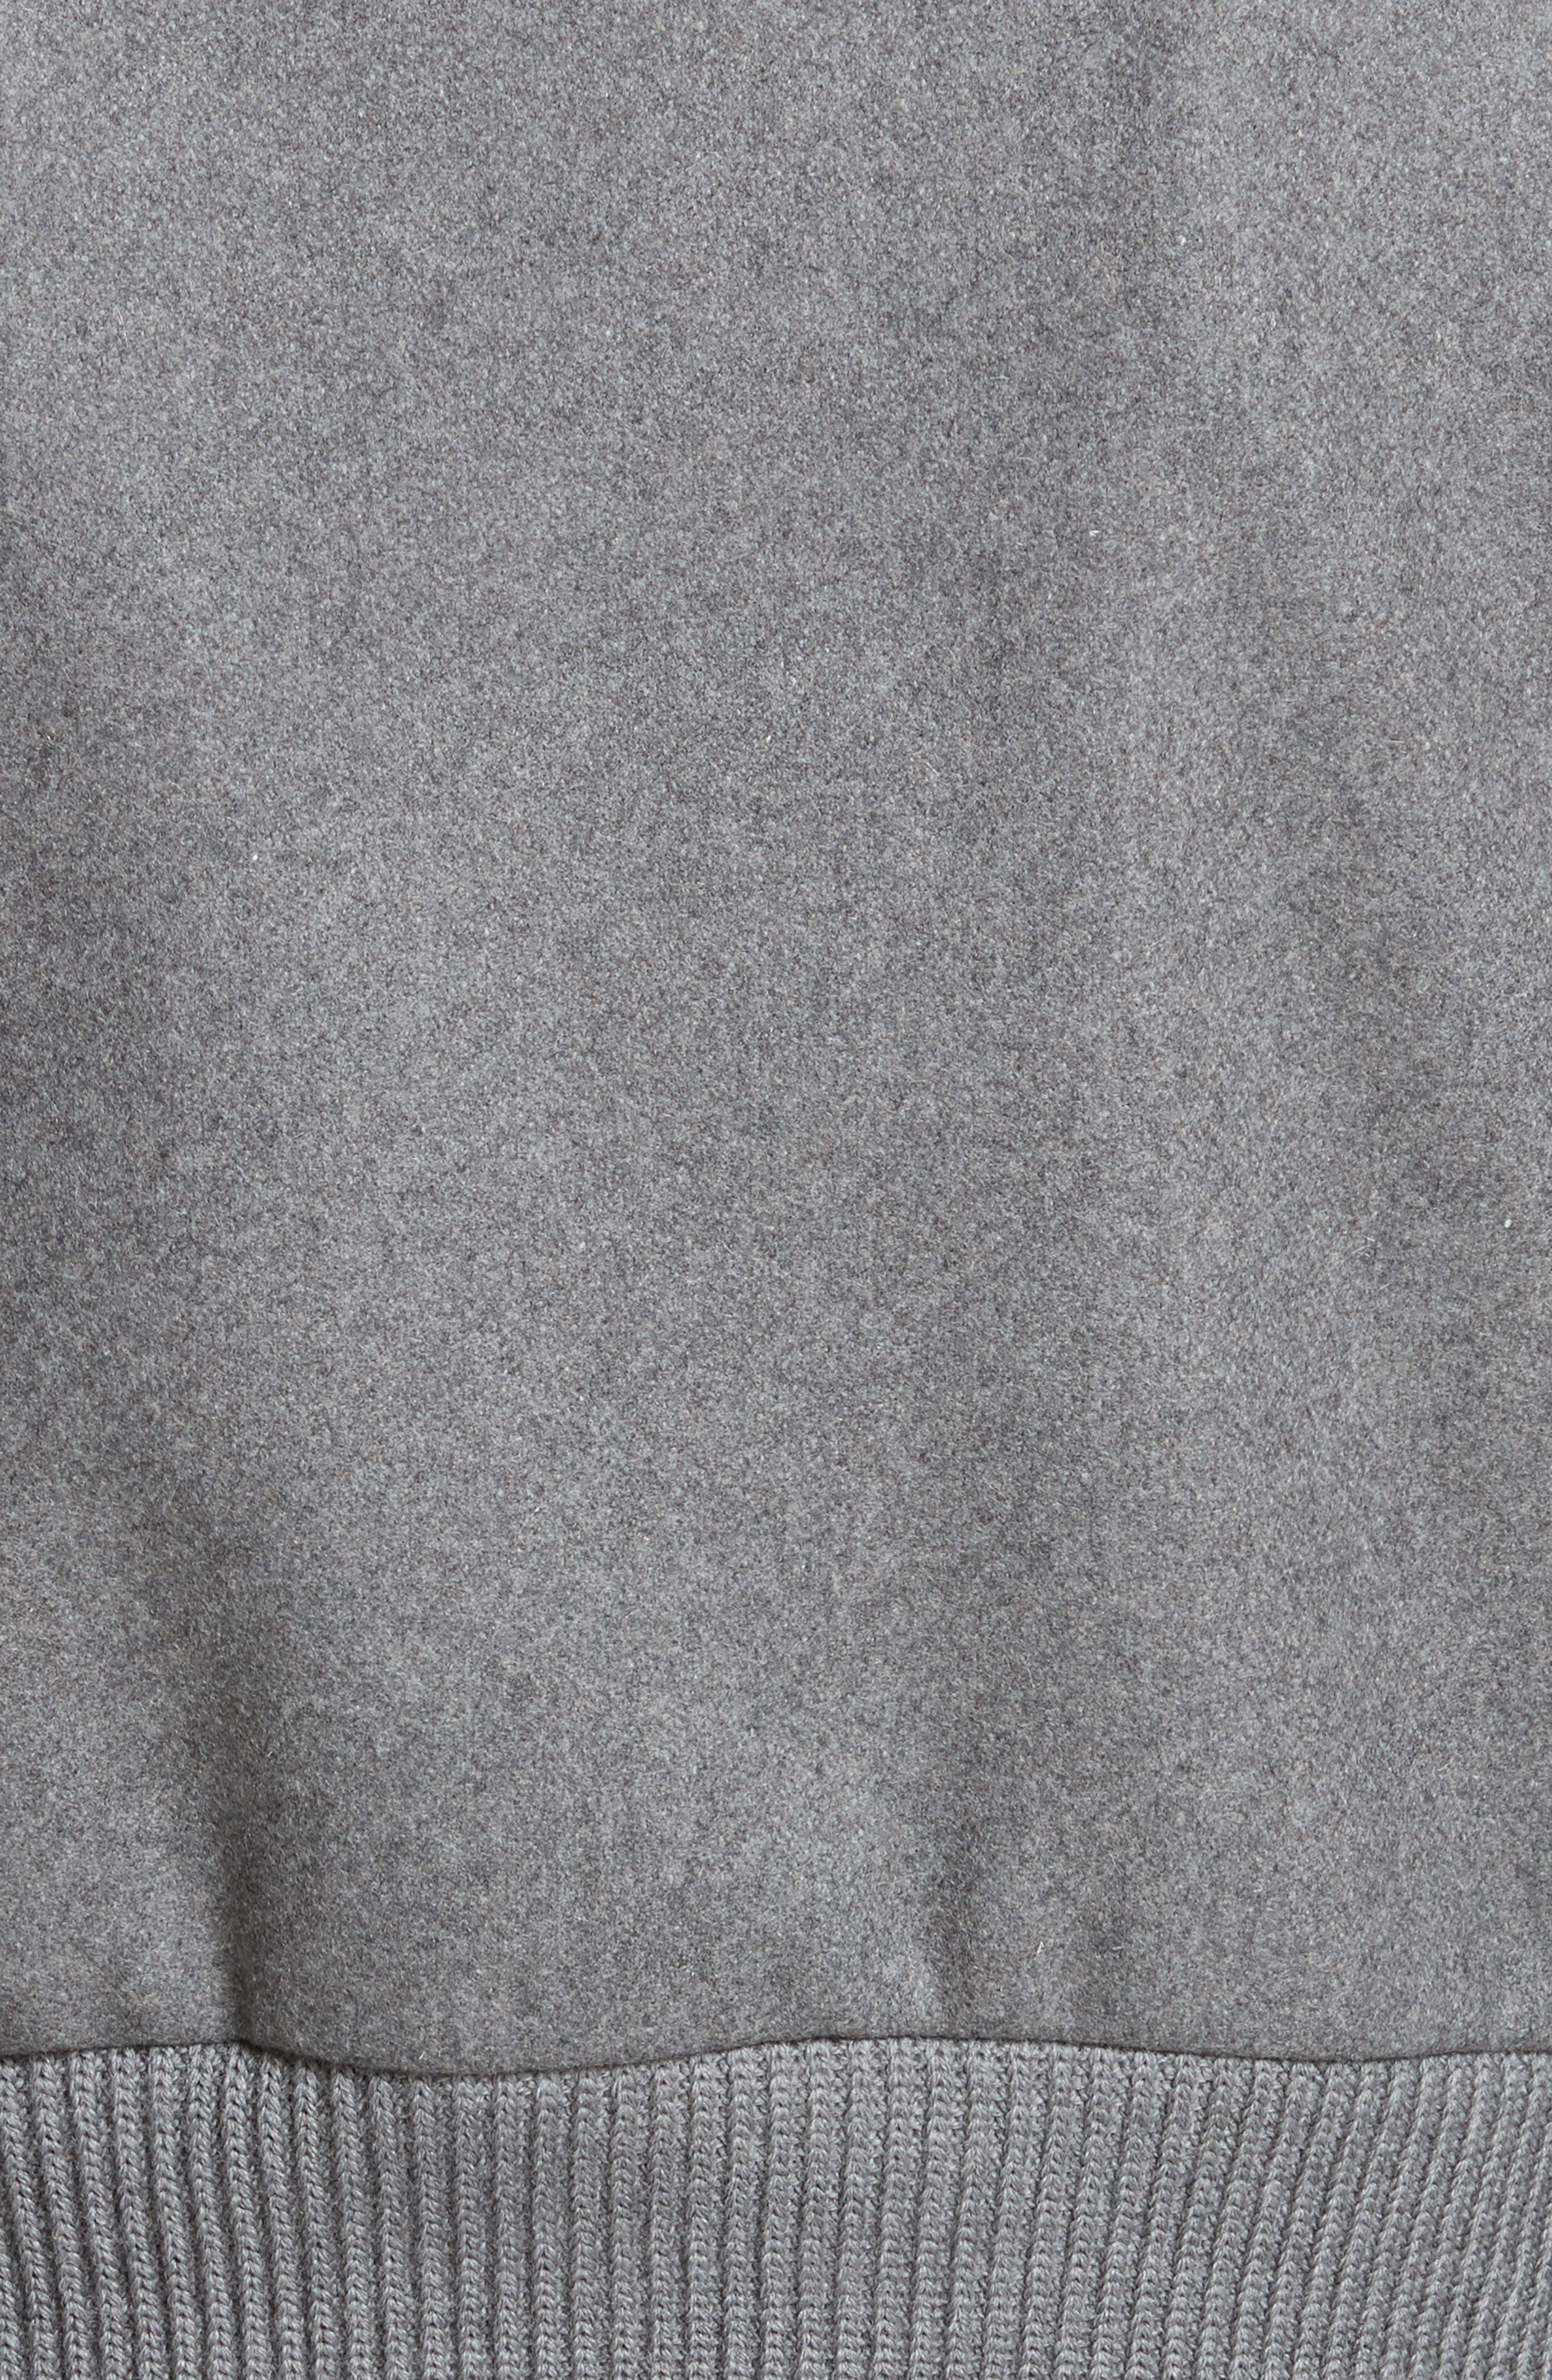 Mélange Wool Blend Jacket,                             Alternate thumbnail 6, color,                             026